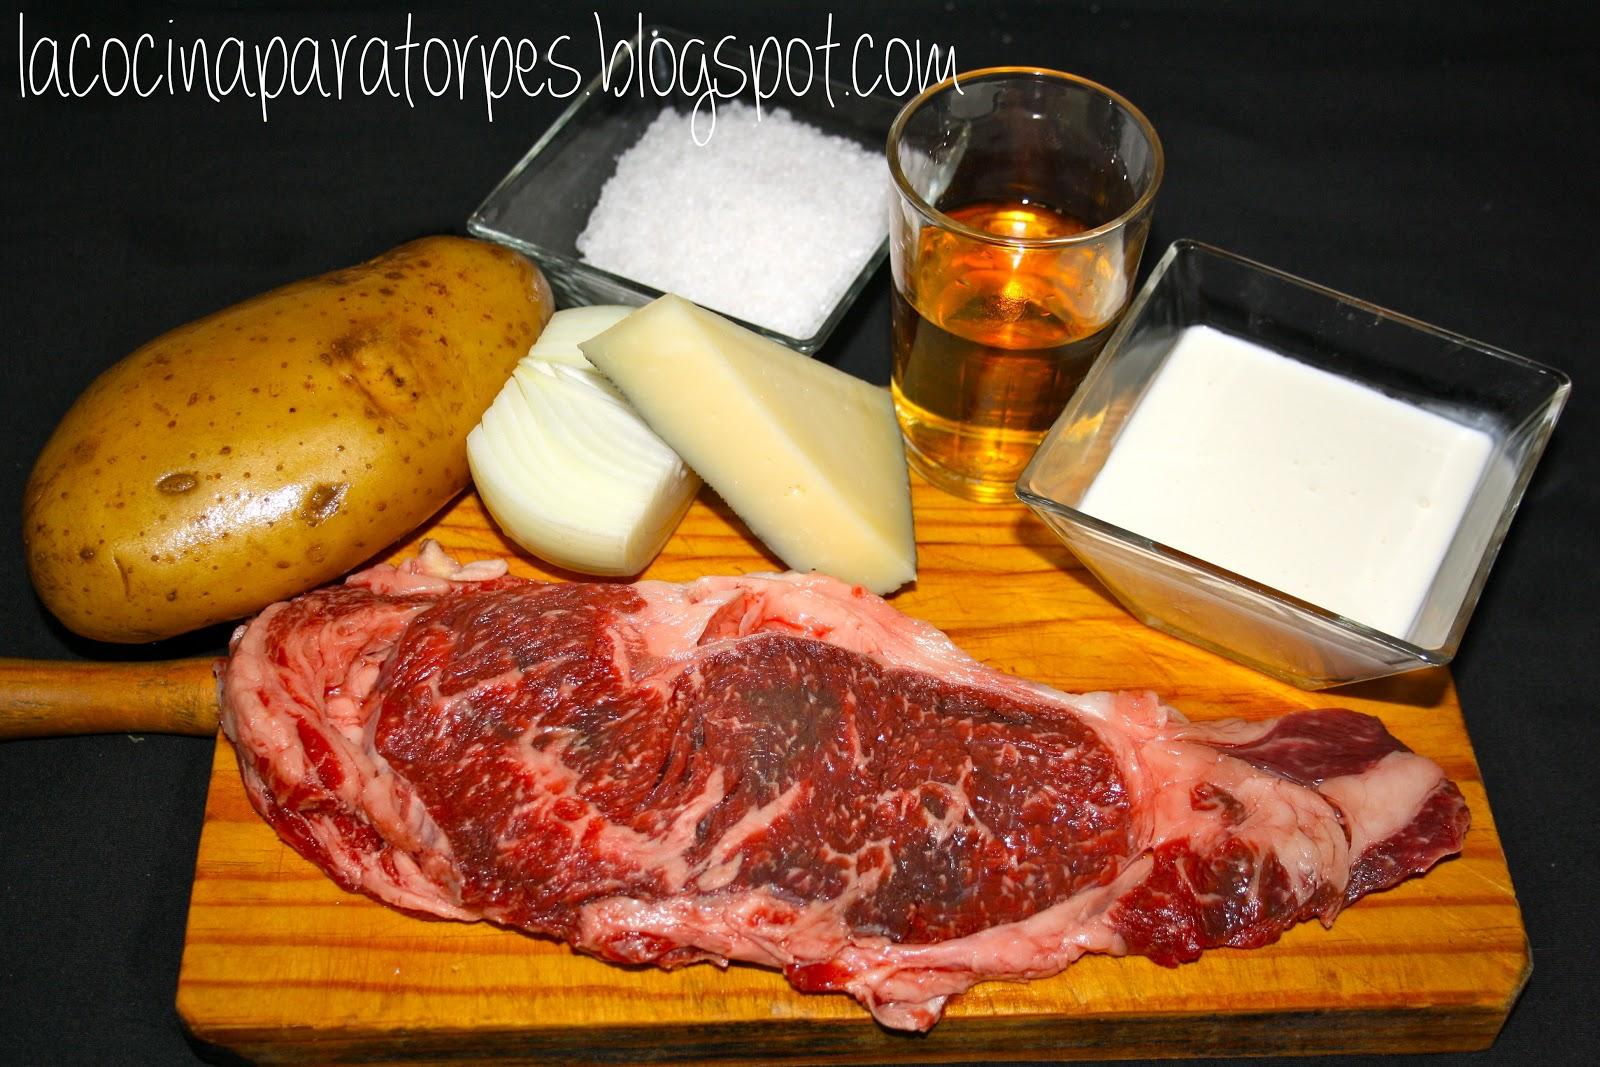 Cocina para torpes receta de entrecot de buey con salsa for Cocinar un entrecot